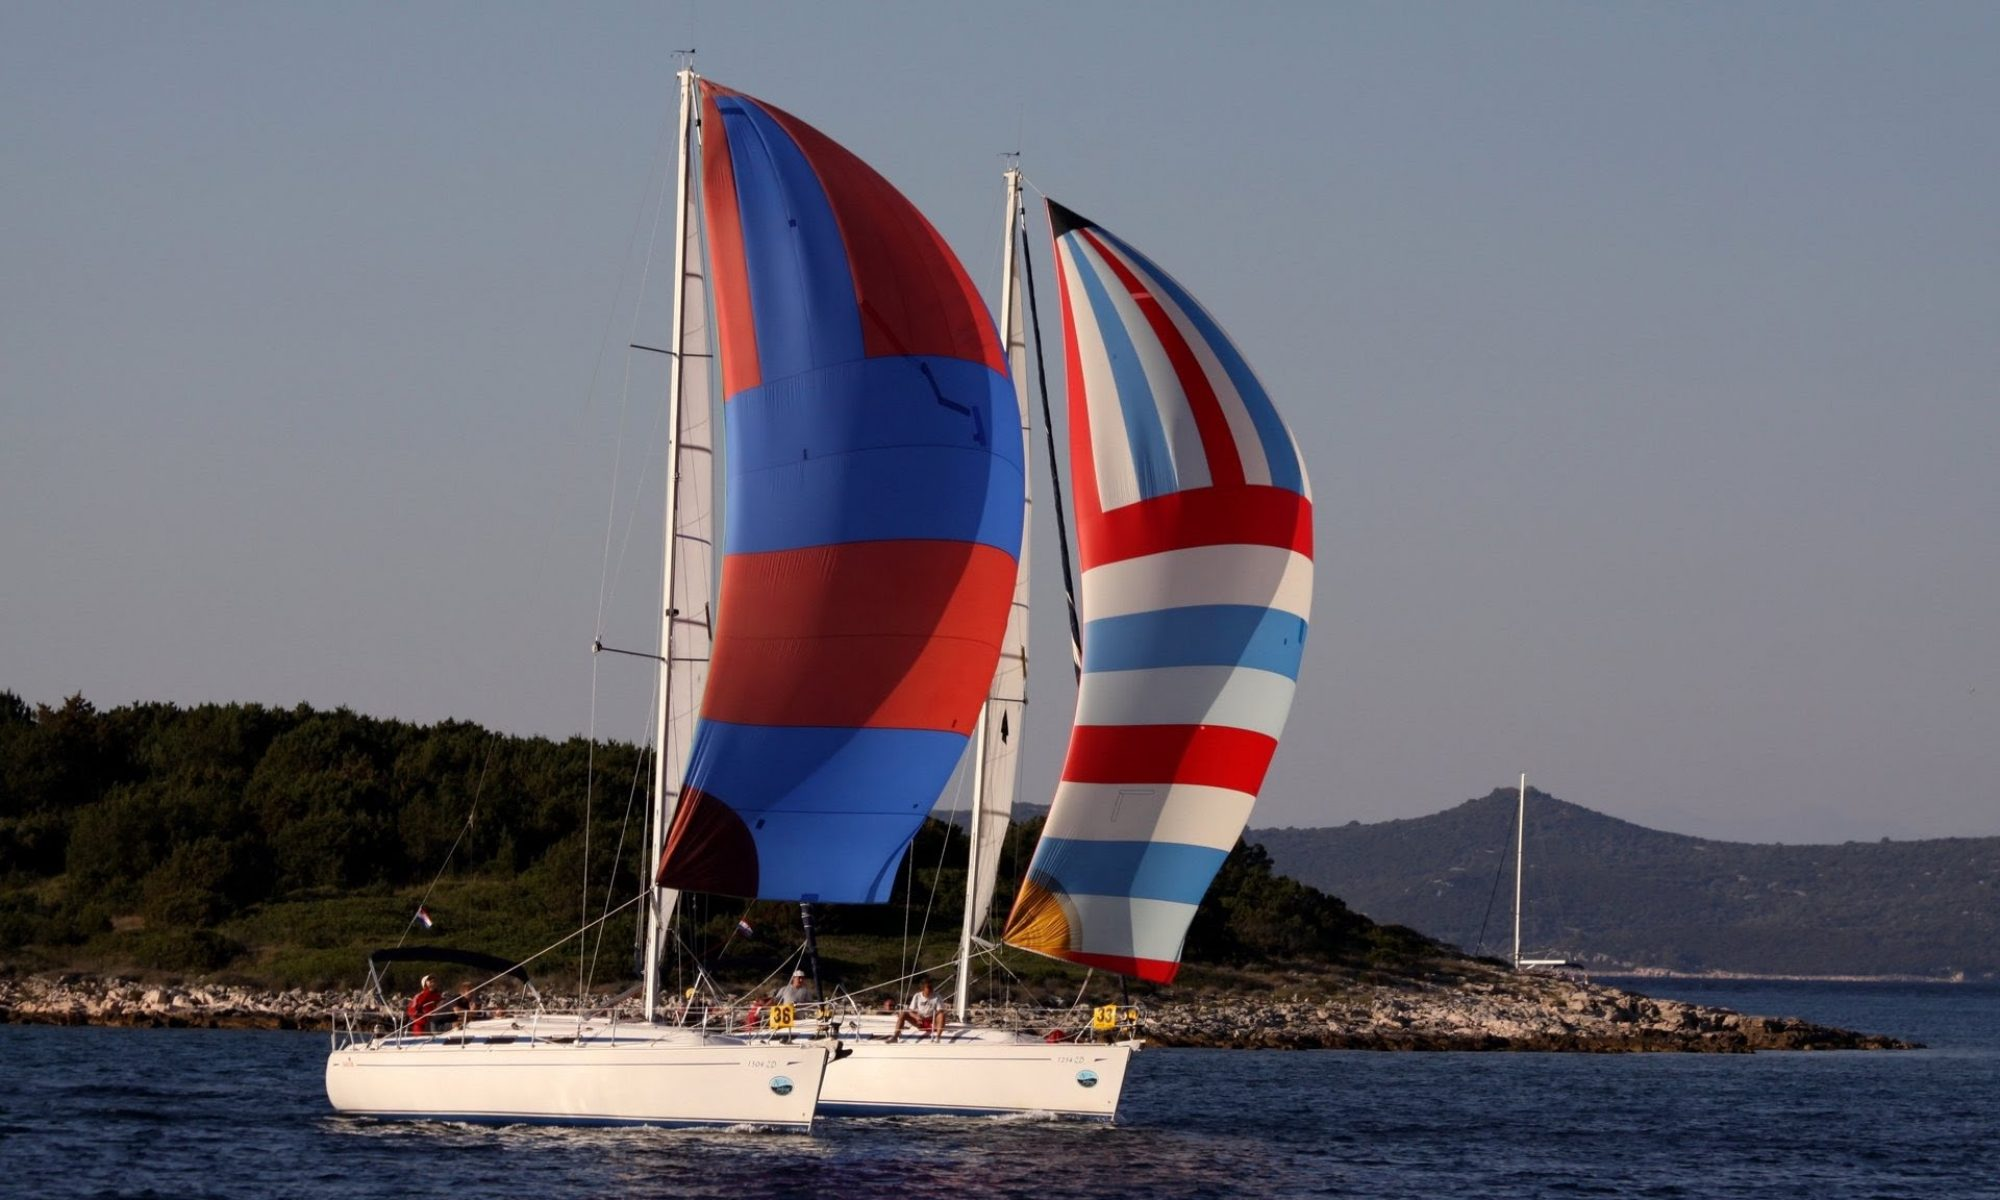 Jadralni klub Odisej